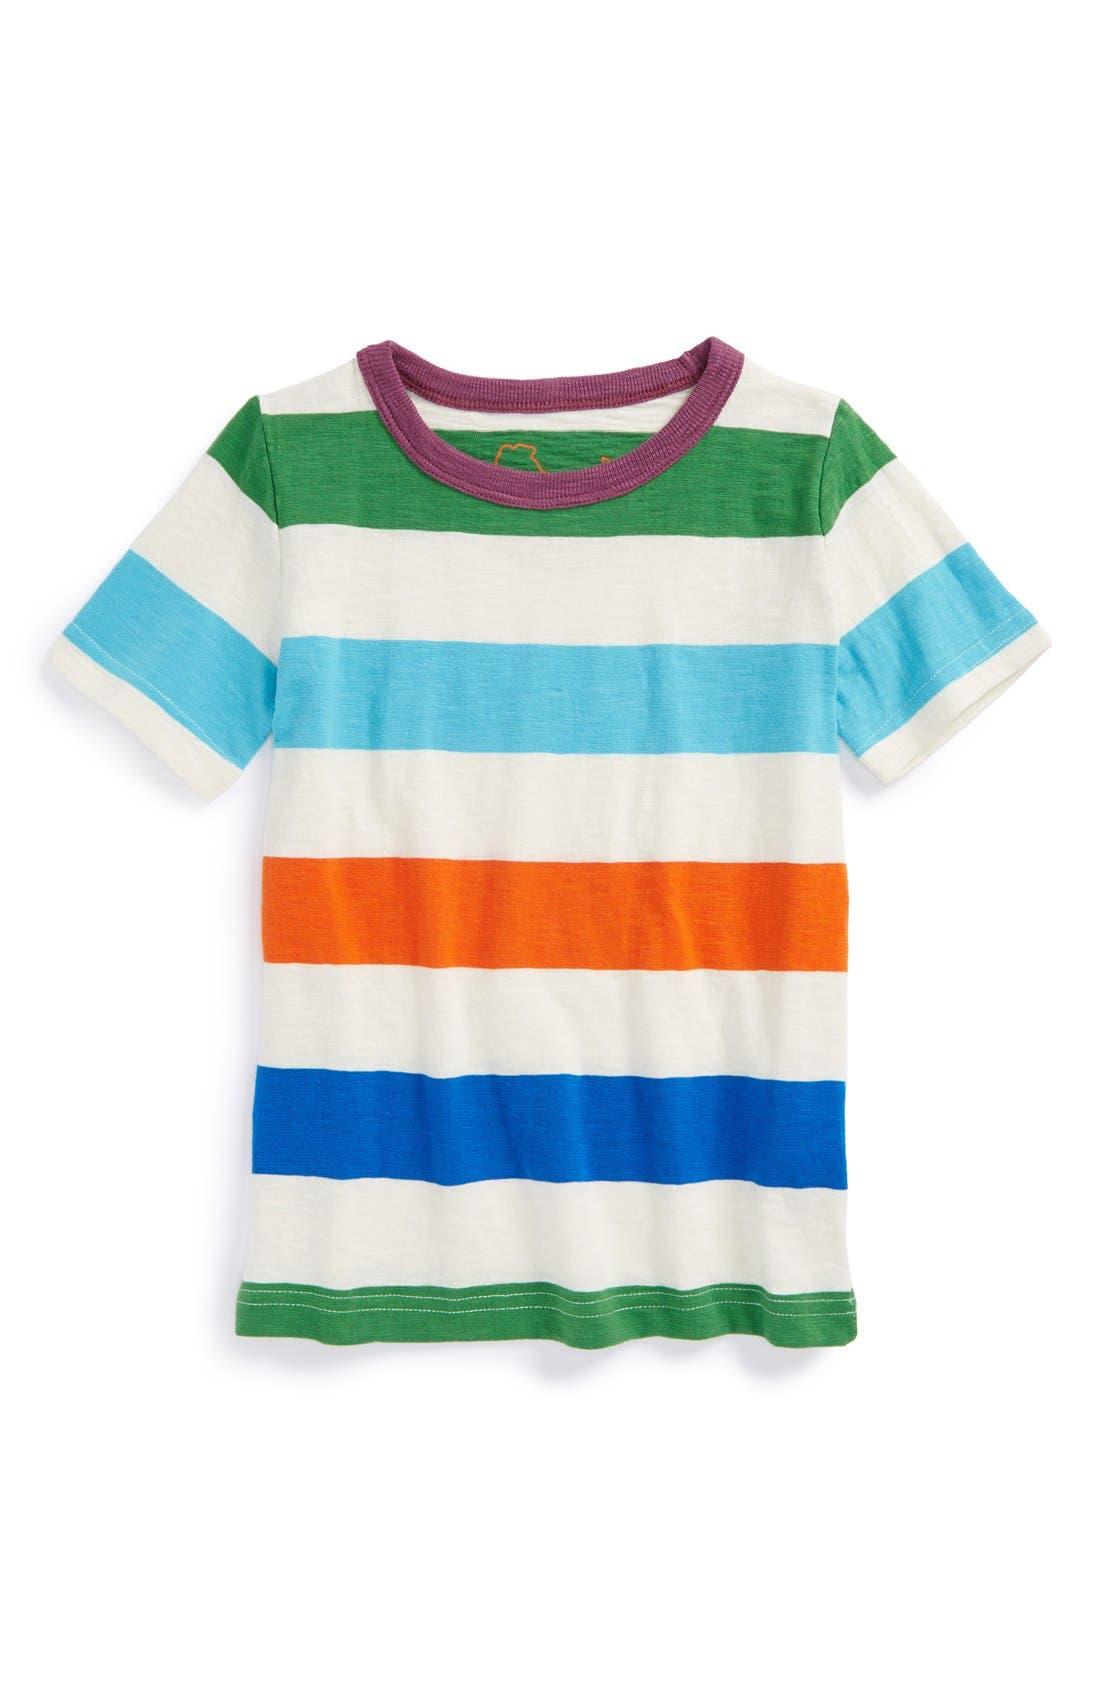 Main Image - Mini Boden 'Stripy' Cotton Jersey T-Shirt (Toddler Boys, Little Boys & Big Boys)